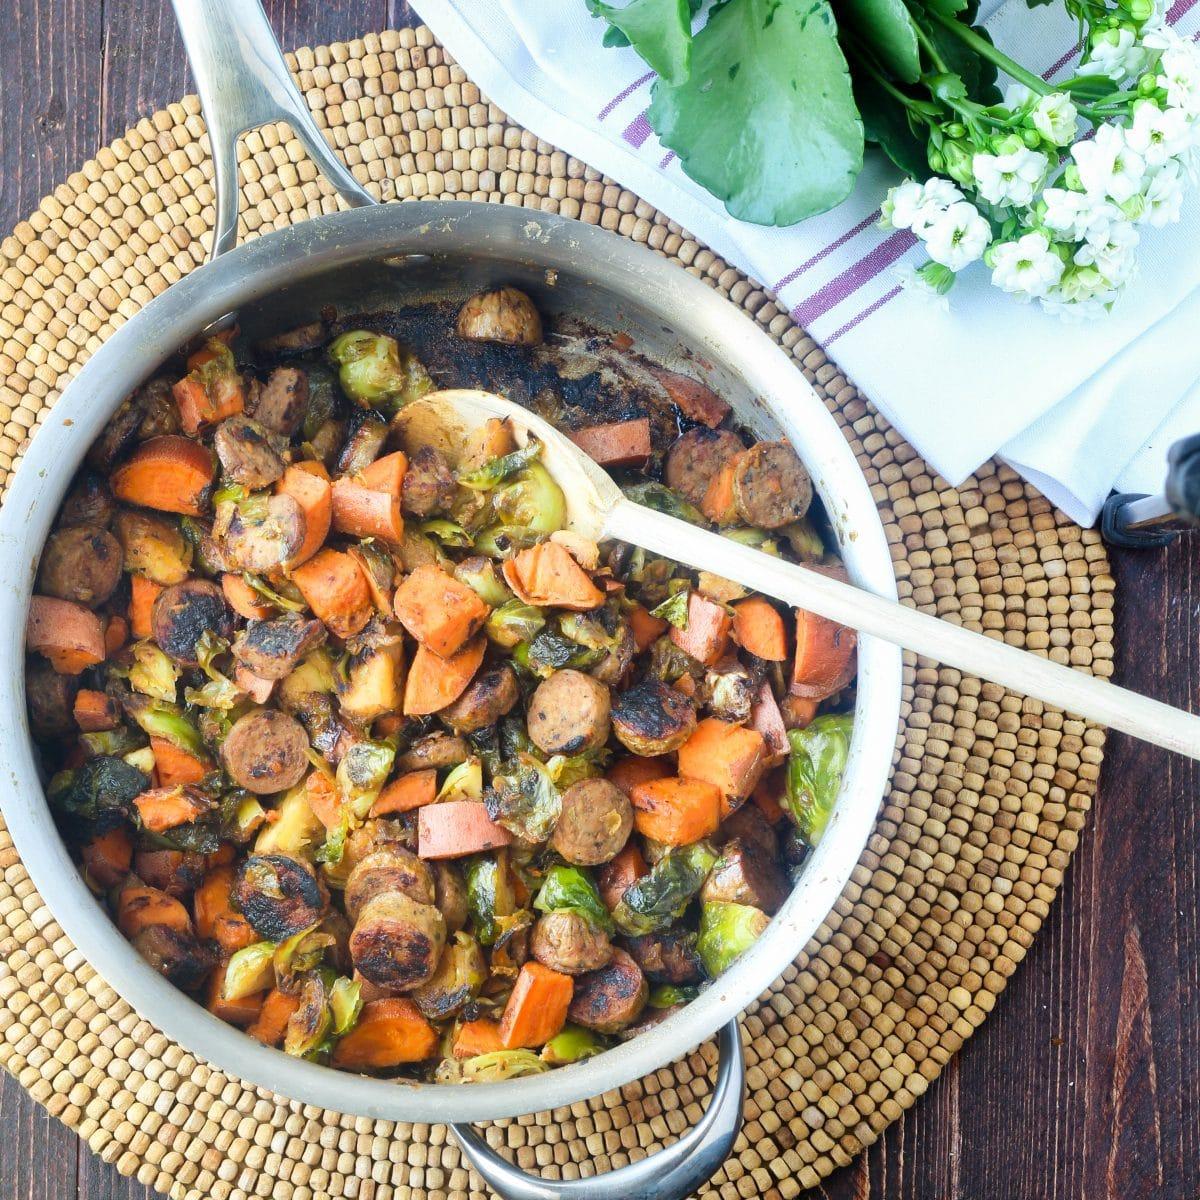 Chicken Sausage Skillet Gluten Free Recipe via hungryhobby.net